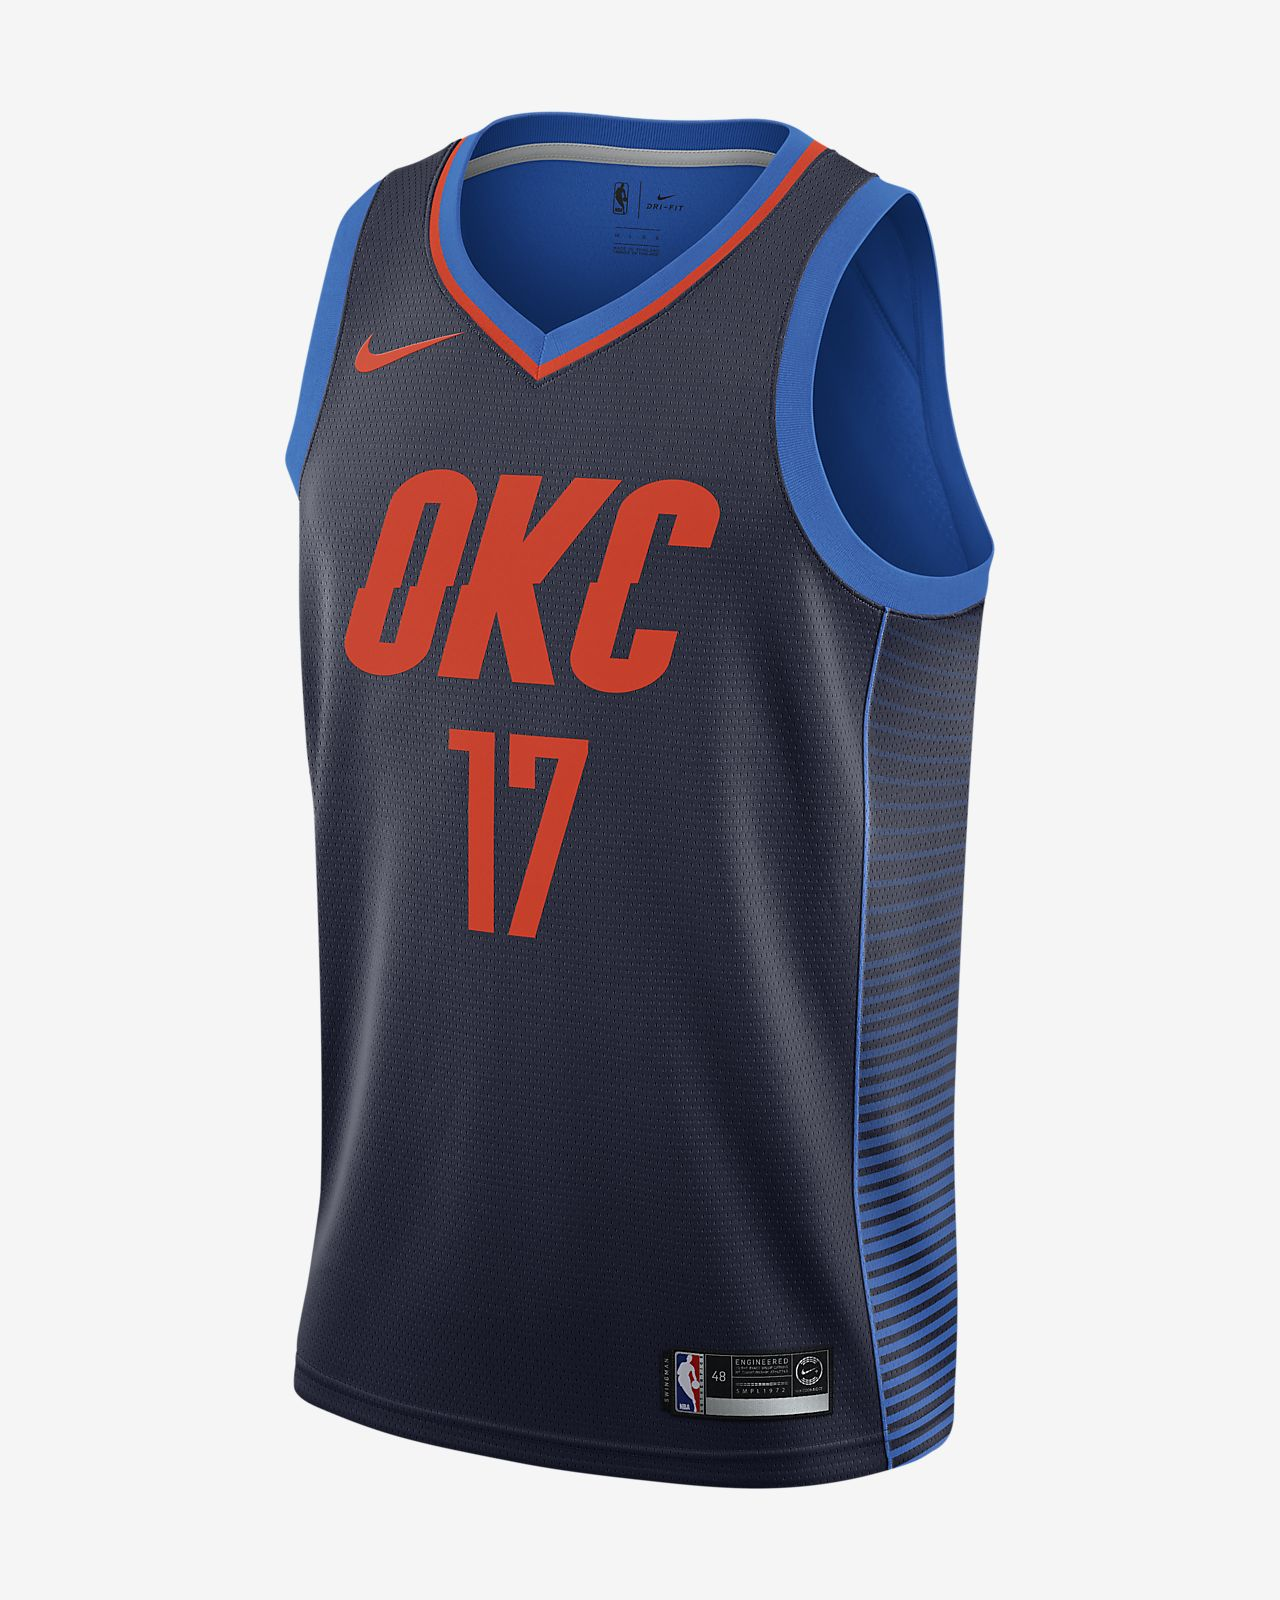 Maglia Nike NBA Connected Statement Edition Swingman (Oklahoma City Thunder) - Uomo